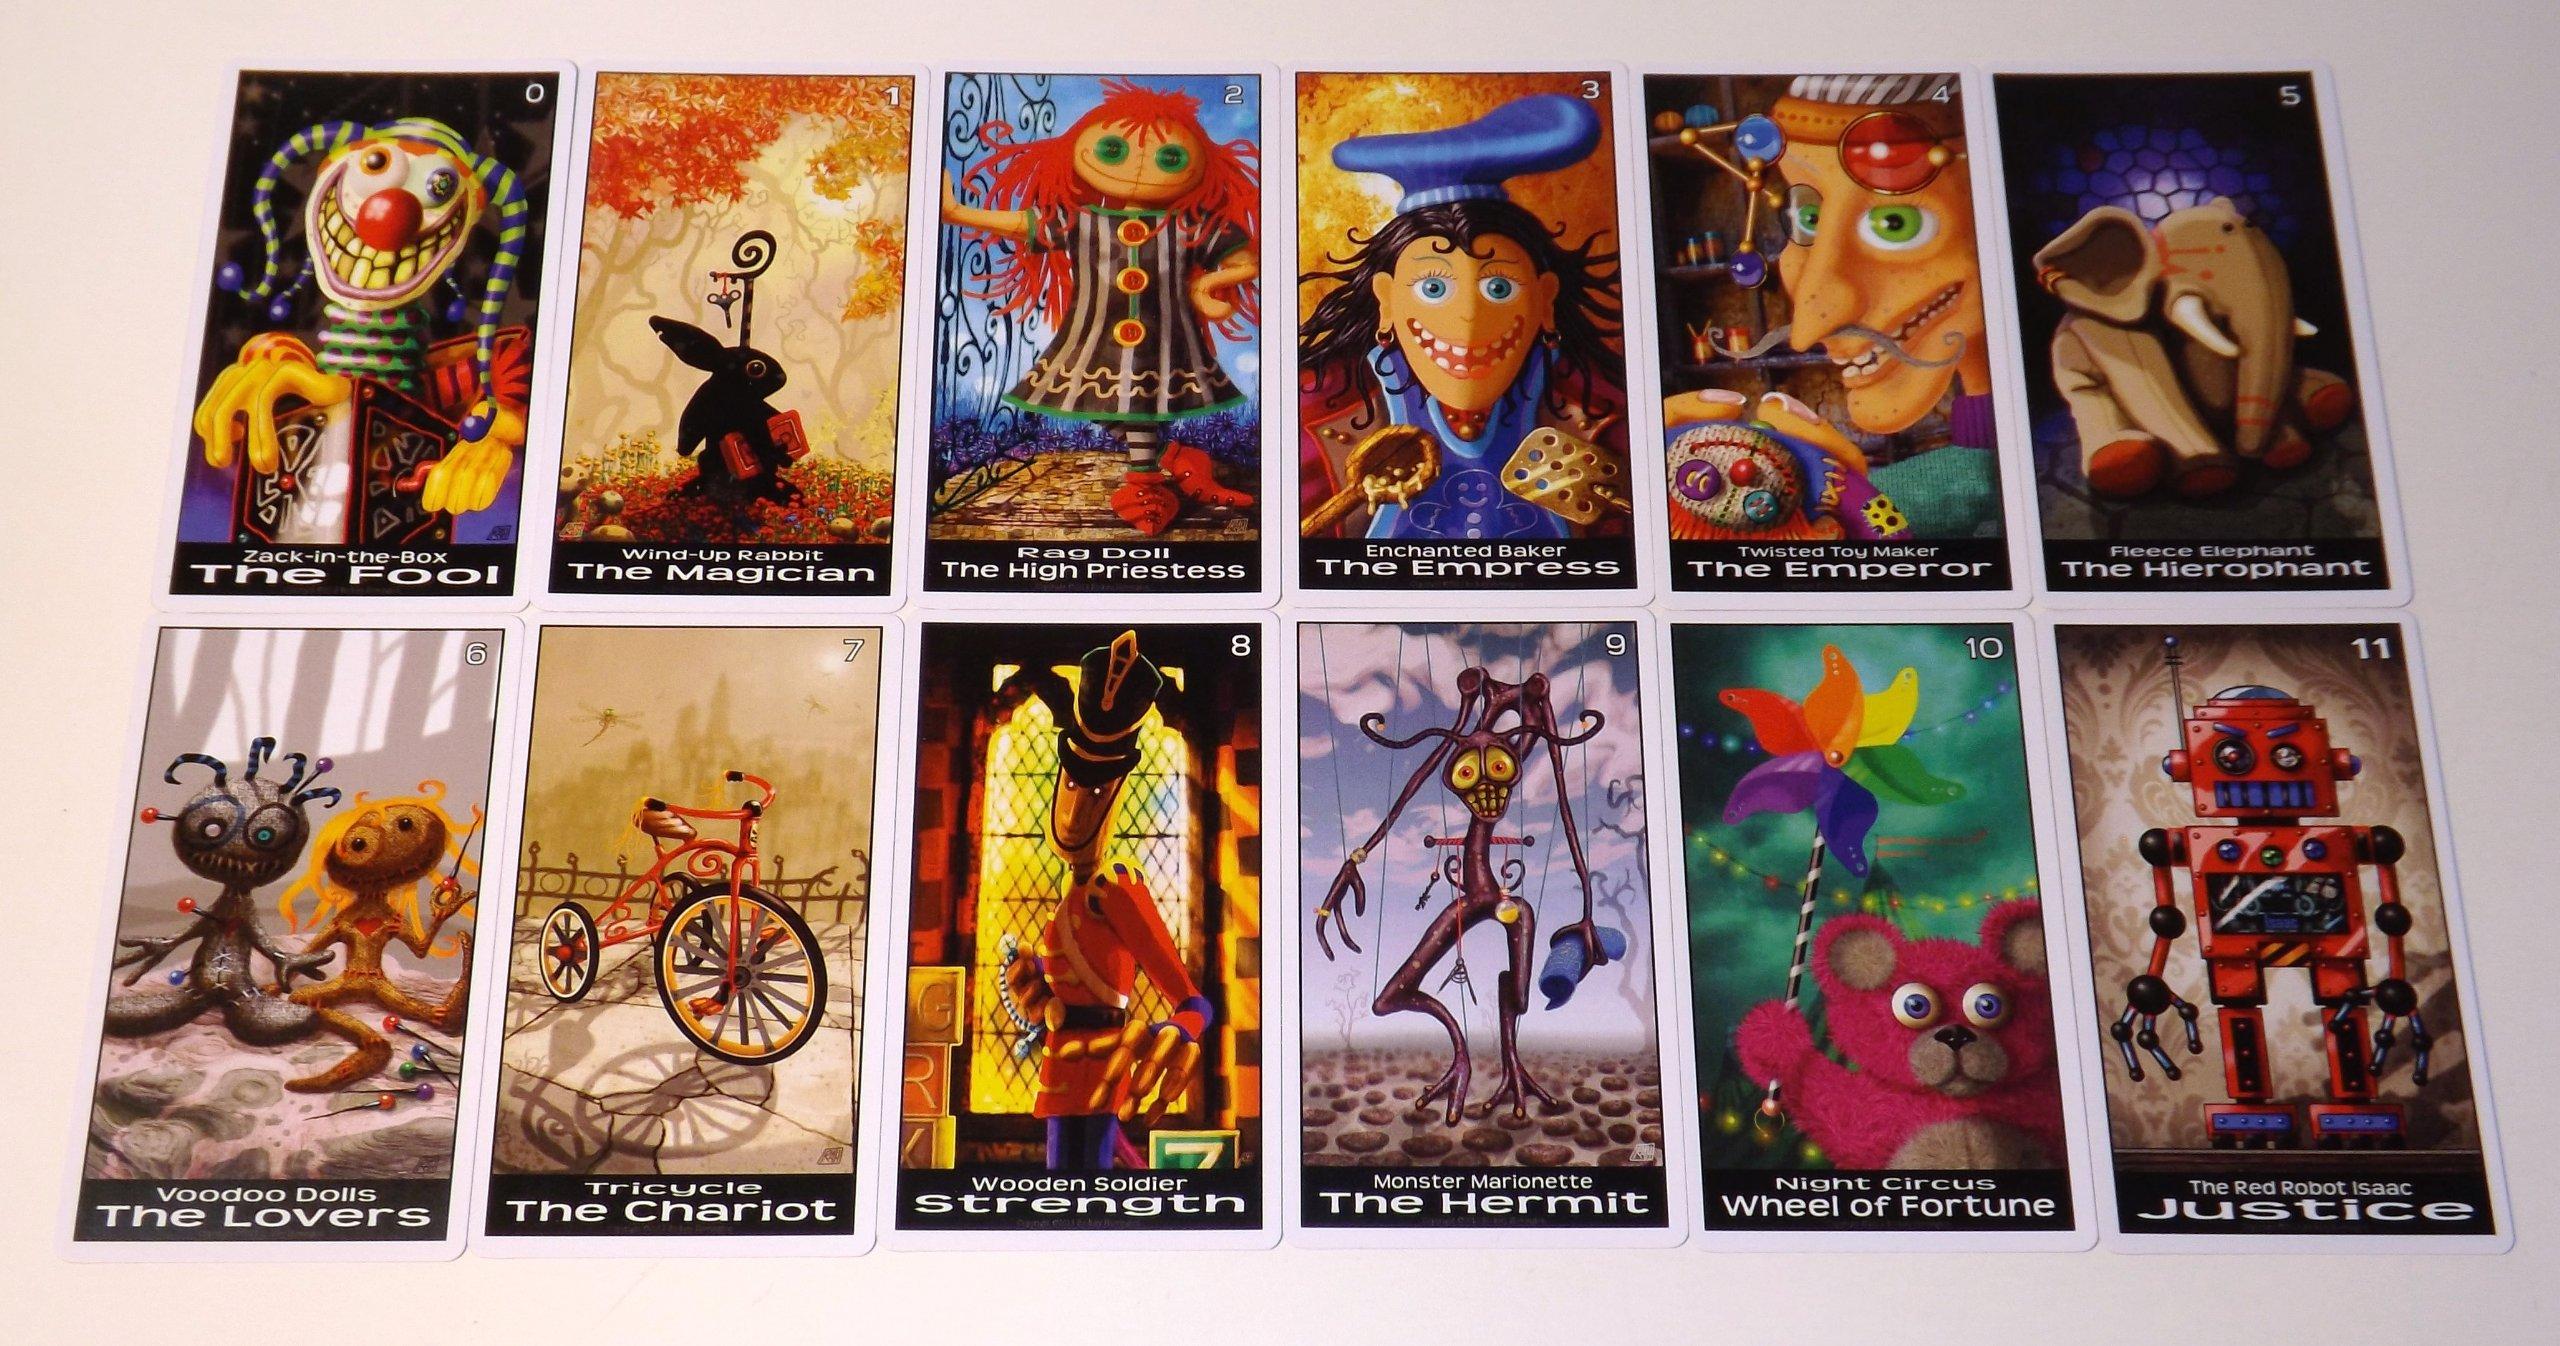 Twisted Toyland Tarot Cards - 22 Card Major Arcana Deck (With Handmade Tarot bag) by Oracles Forest Studios (Image #3)